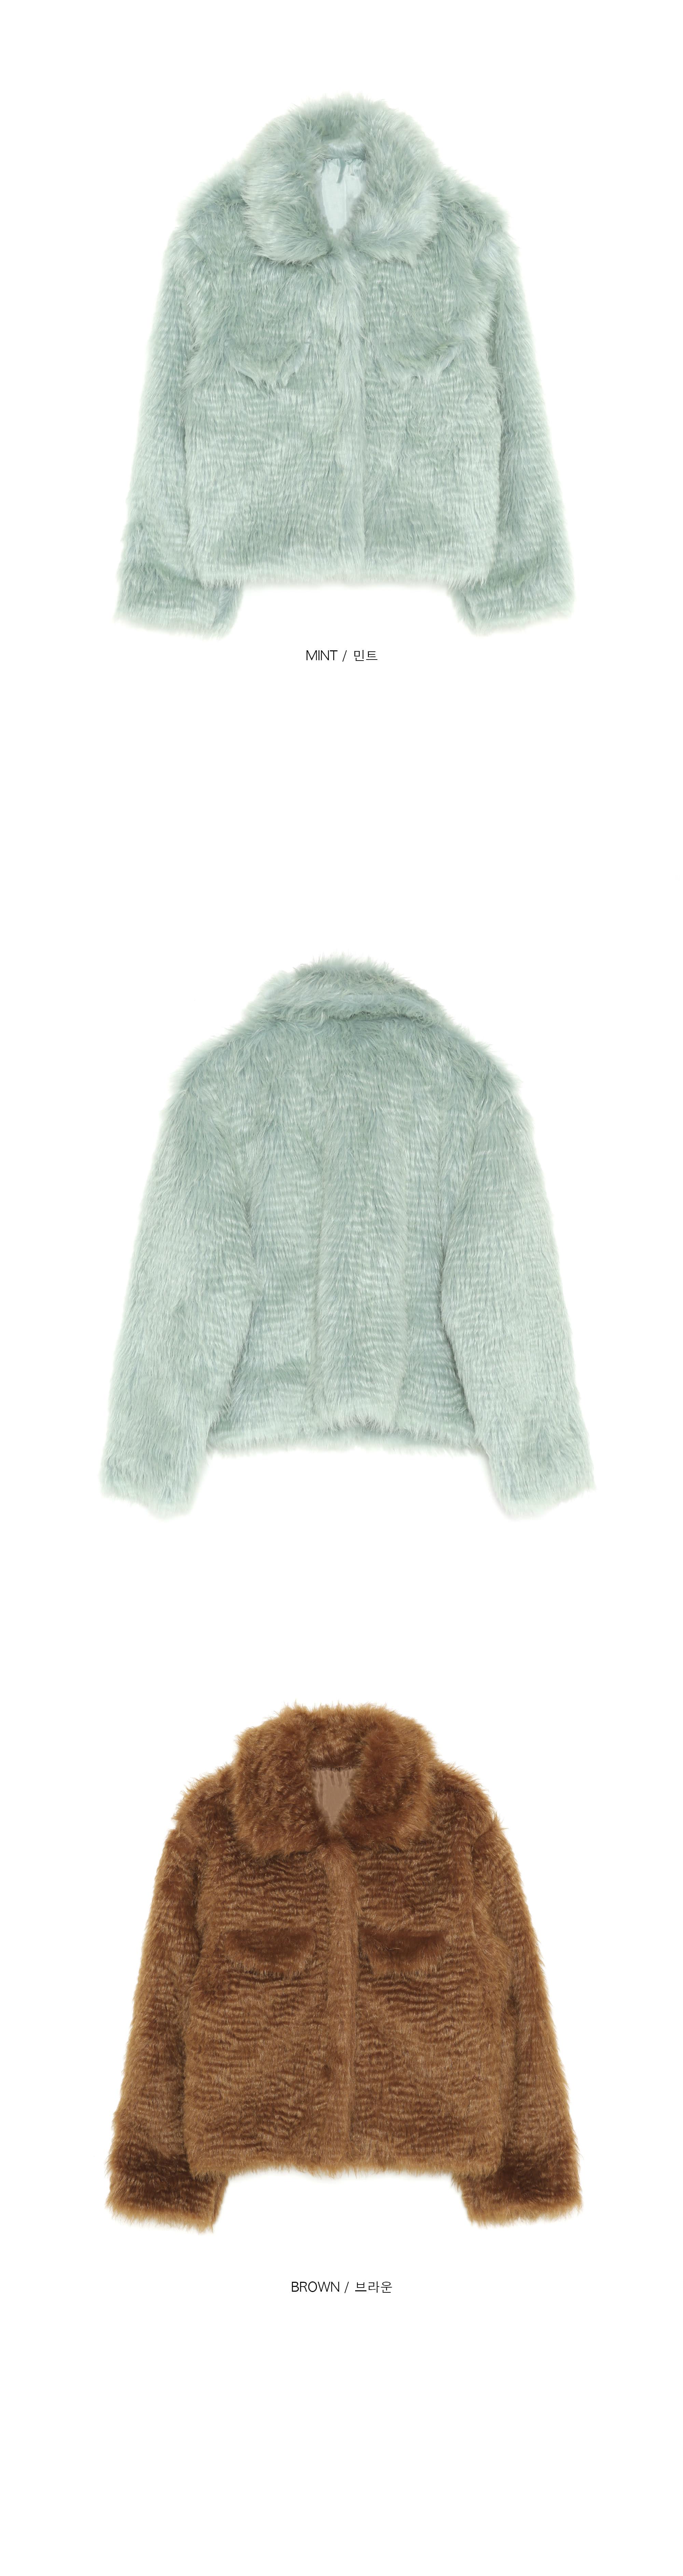 wave collar fur jacket - woman